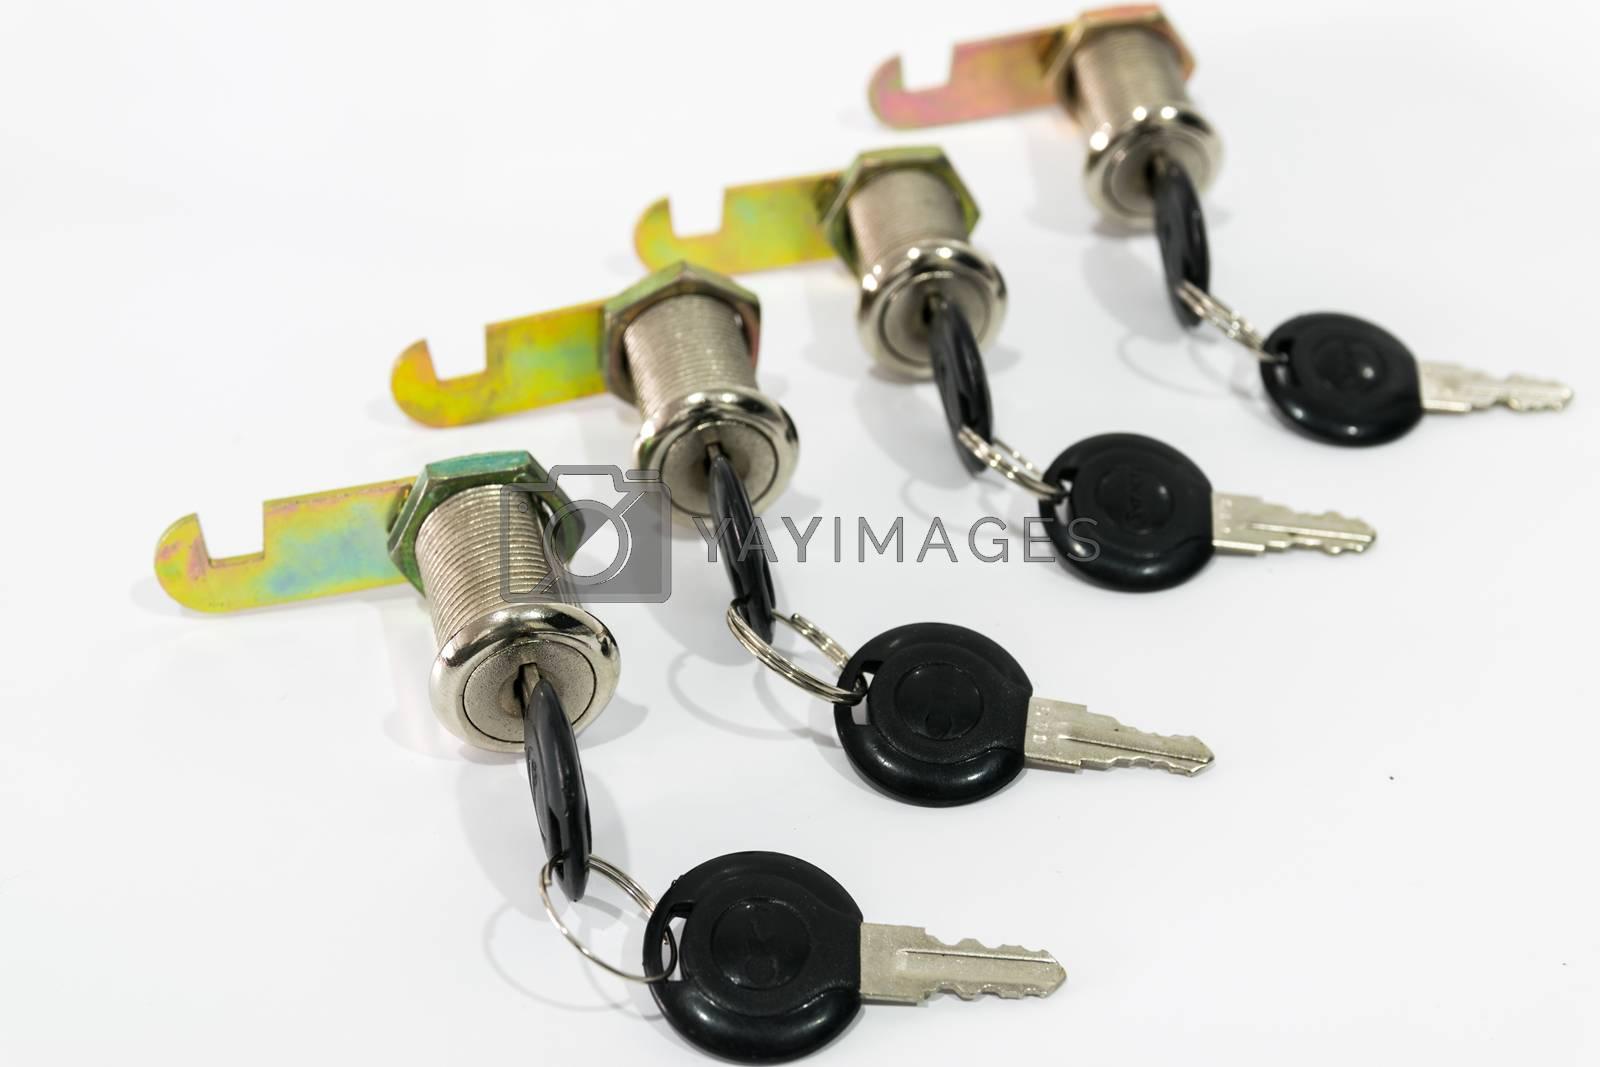 Locker keys isolated on white back ground.